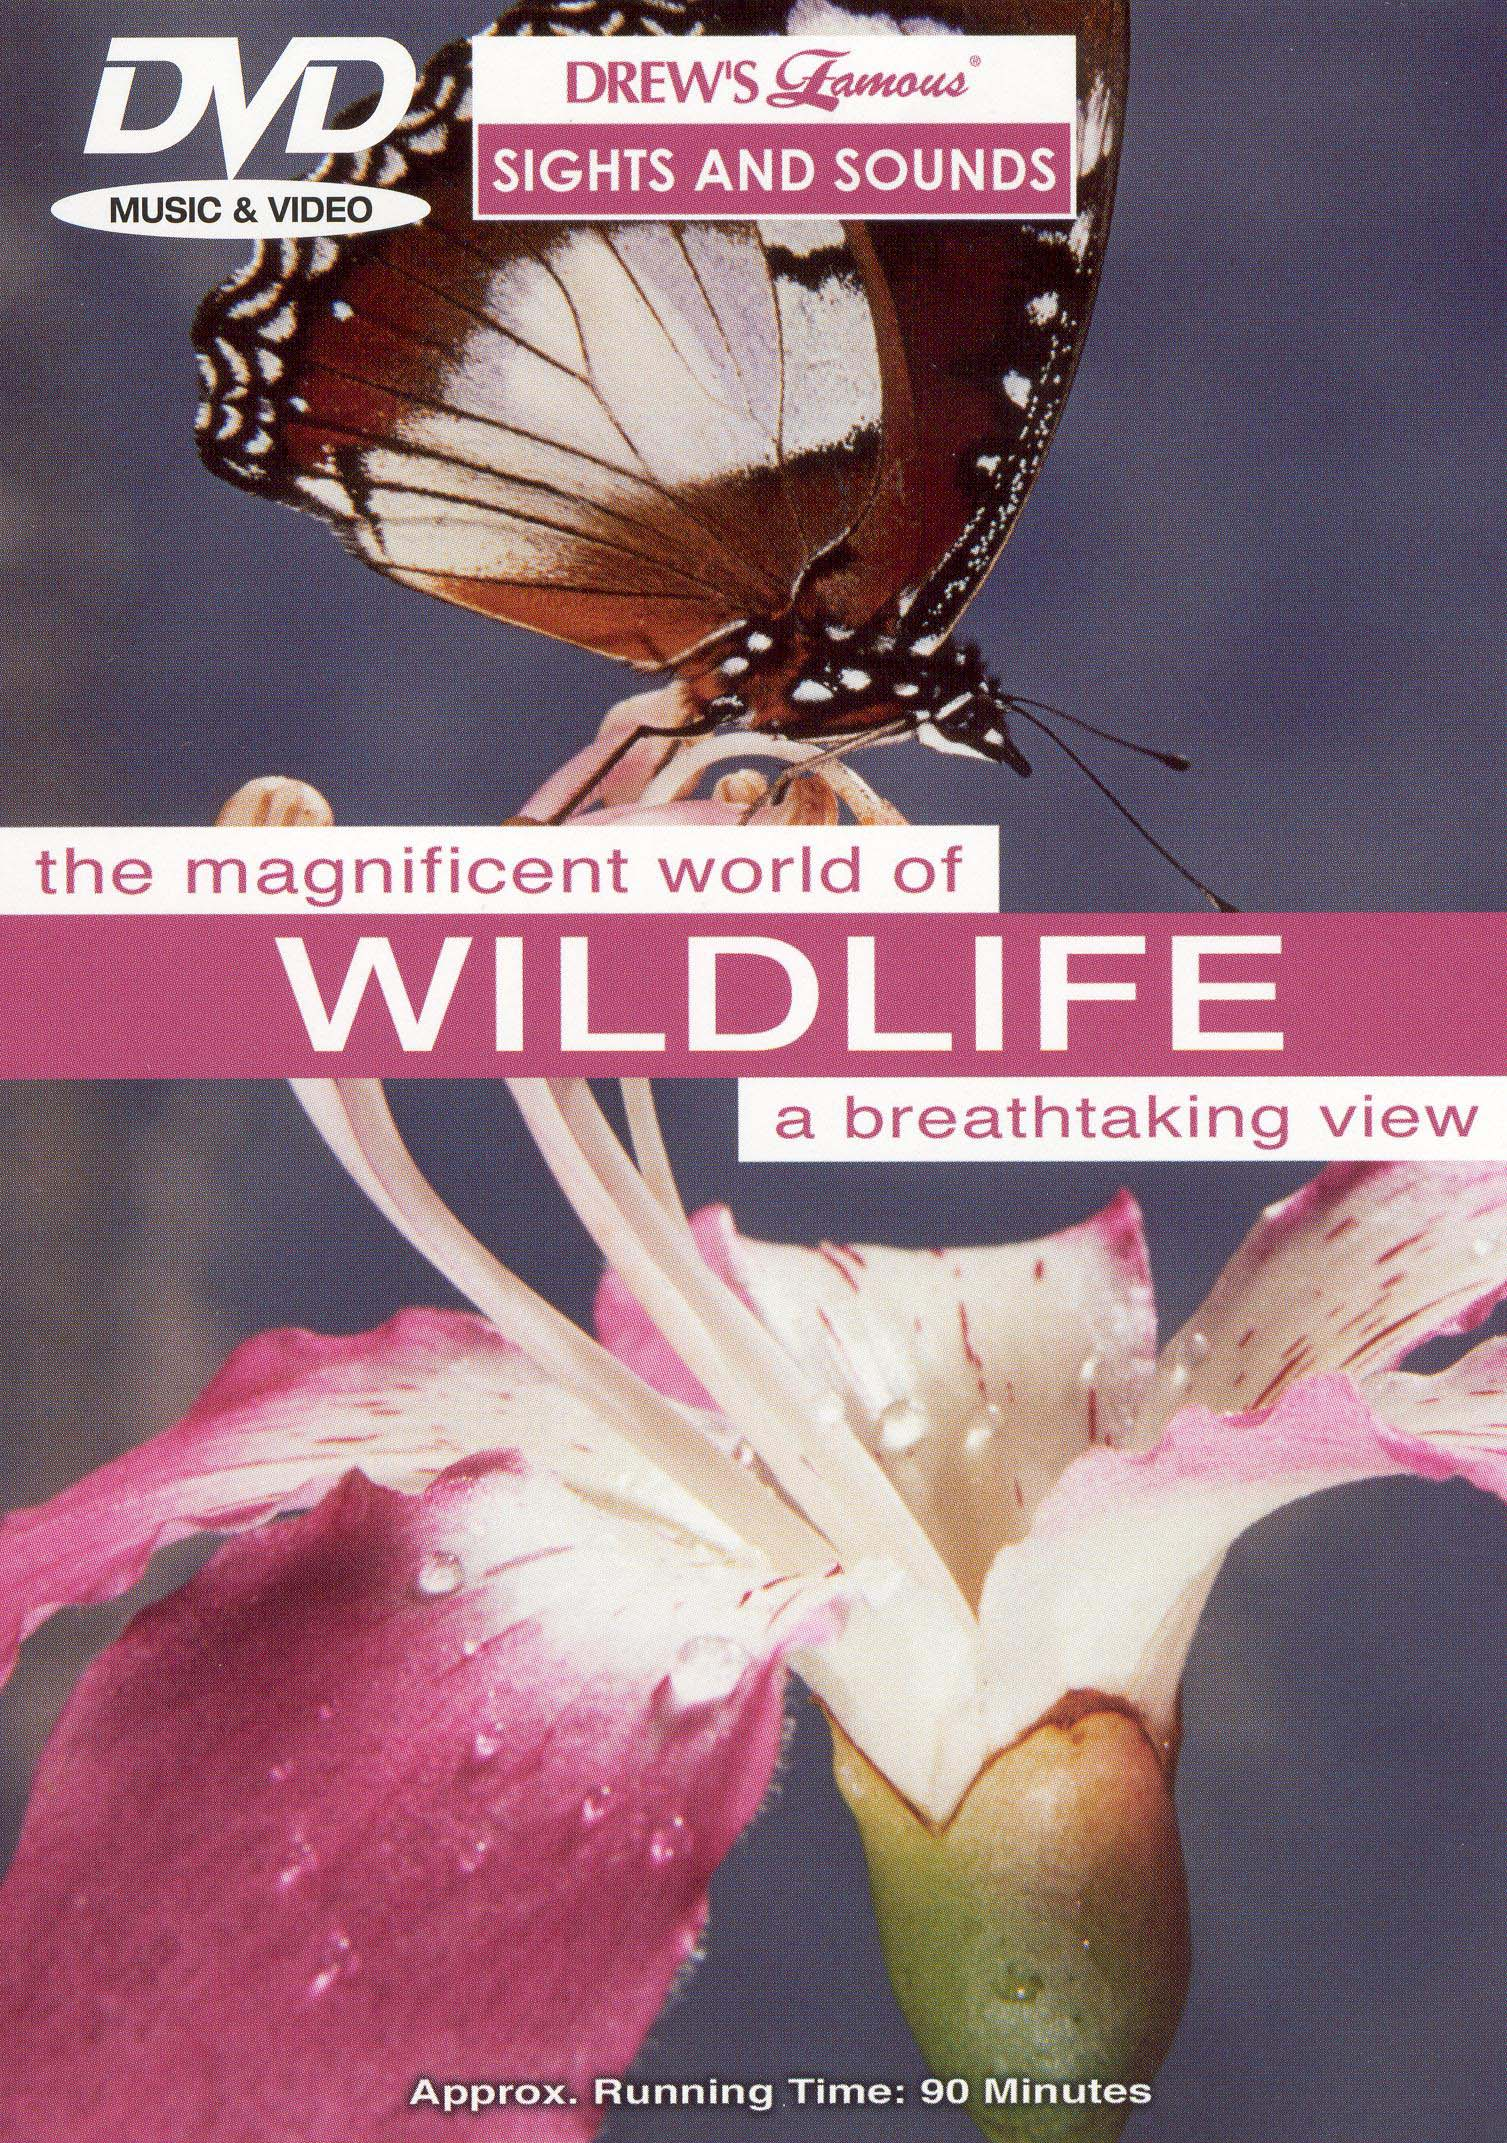 Drew's Famous Sights & Sounds: Wildlife